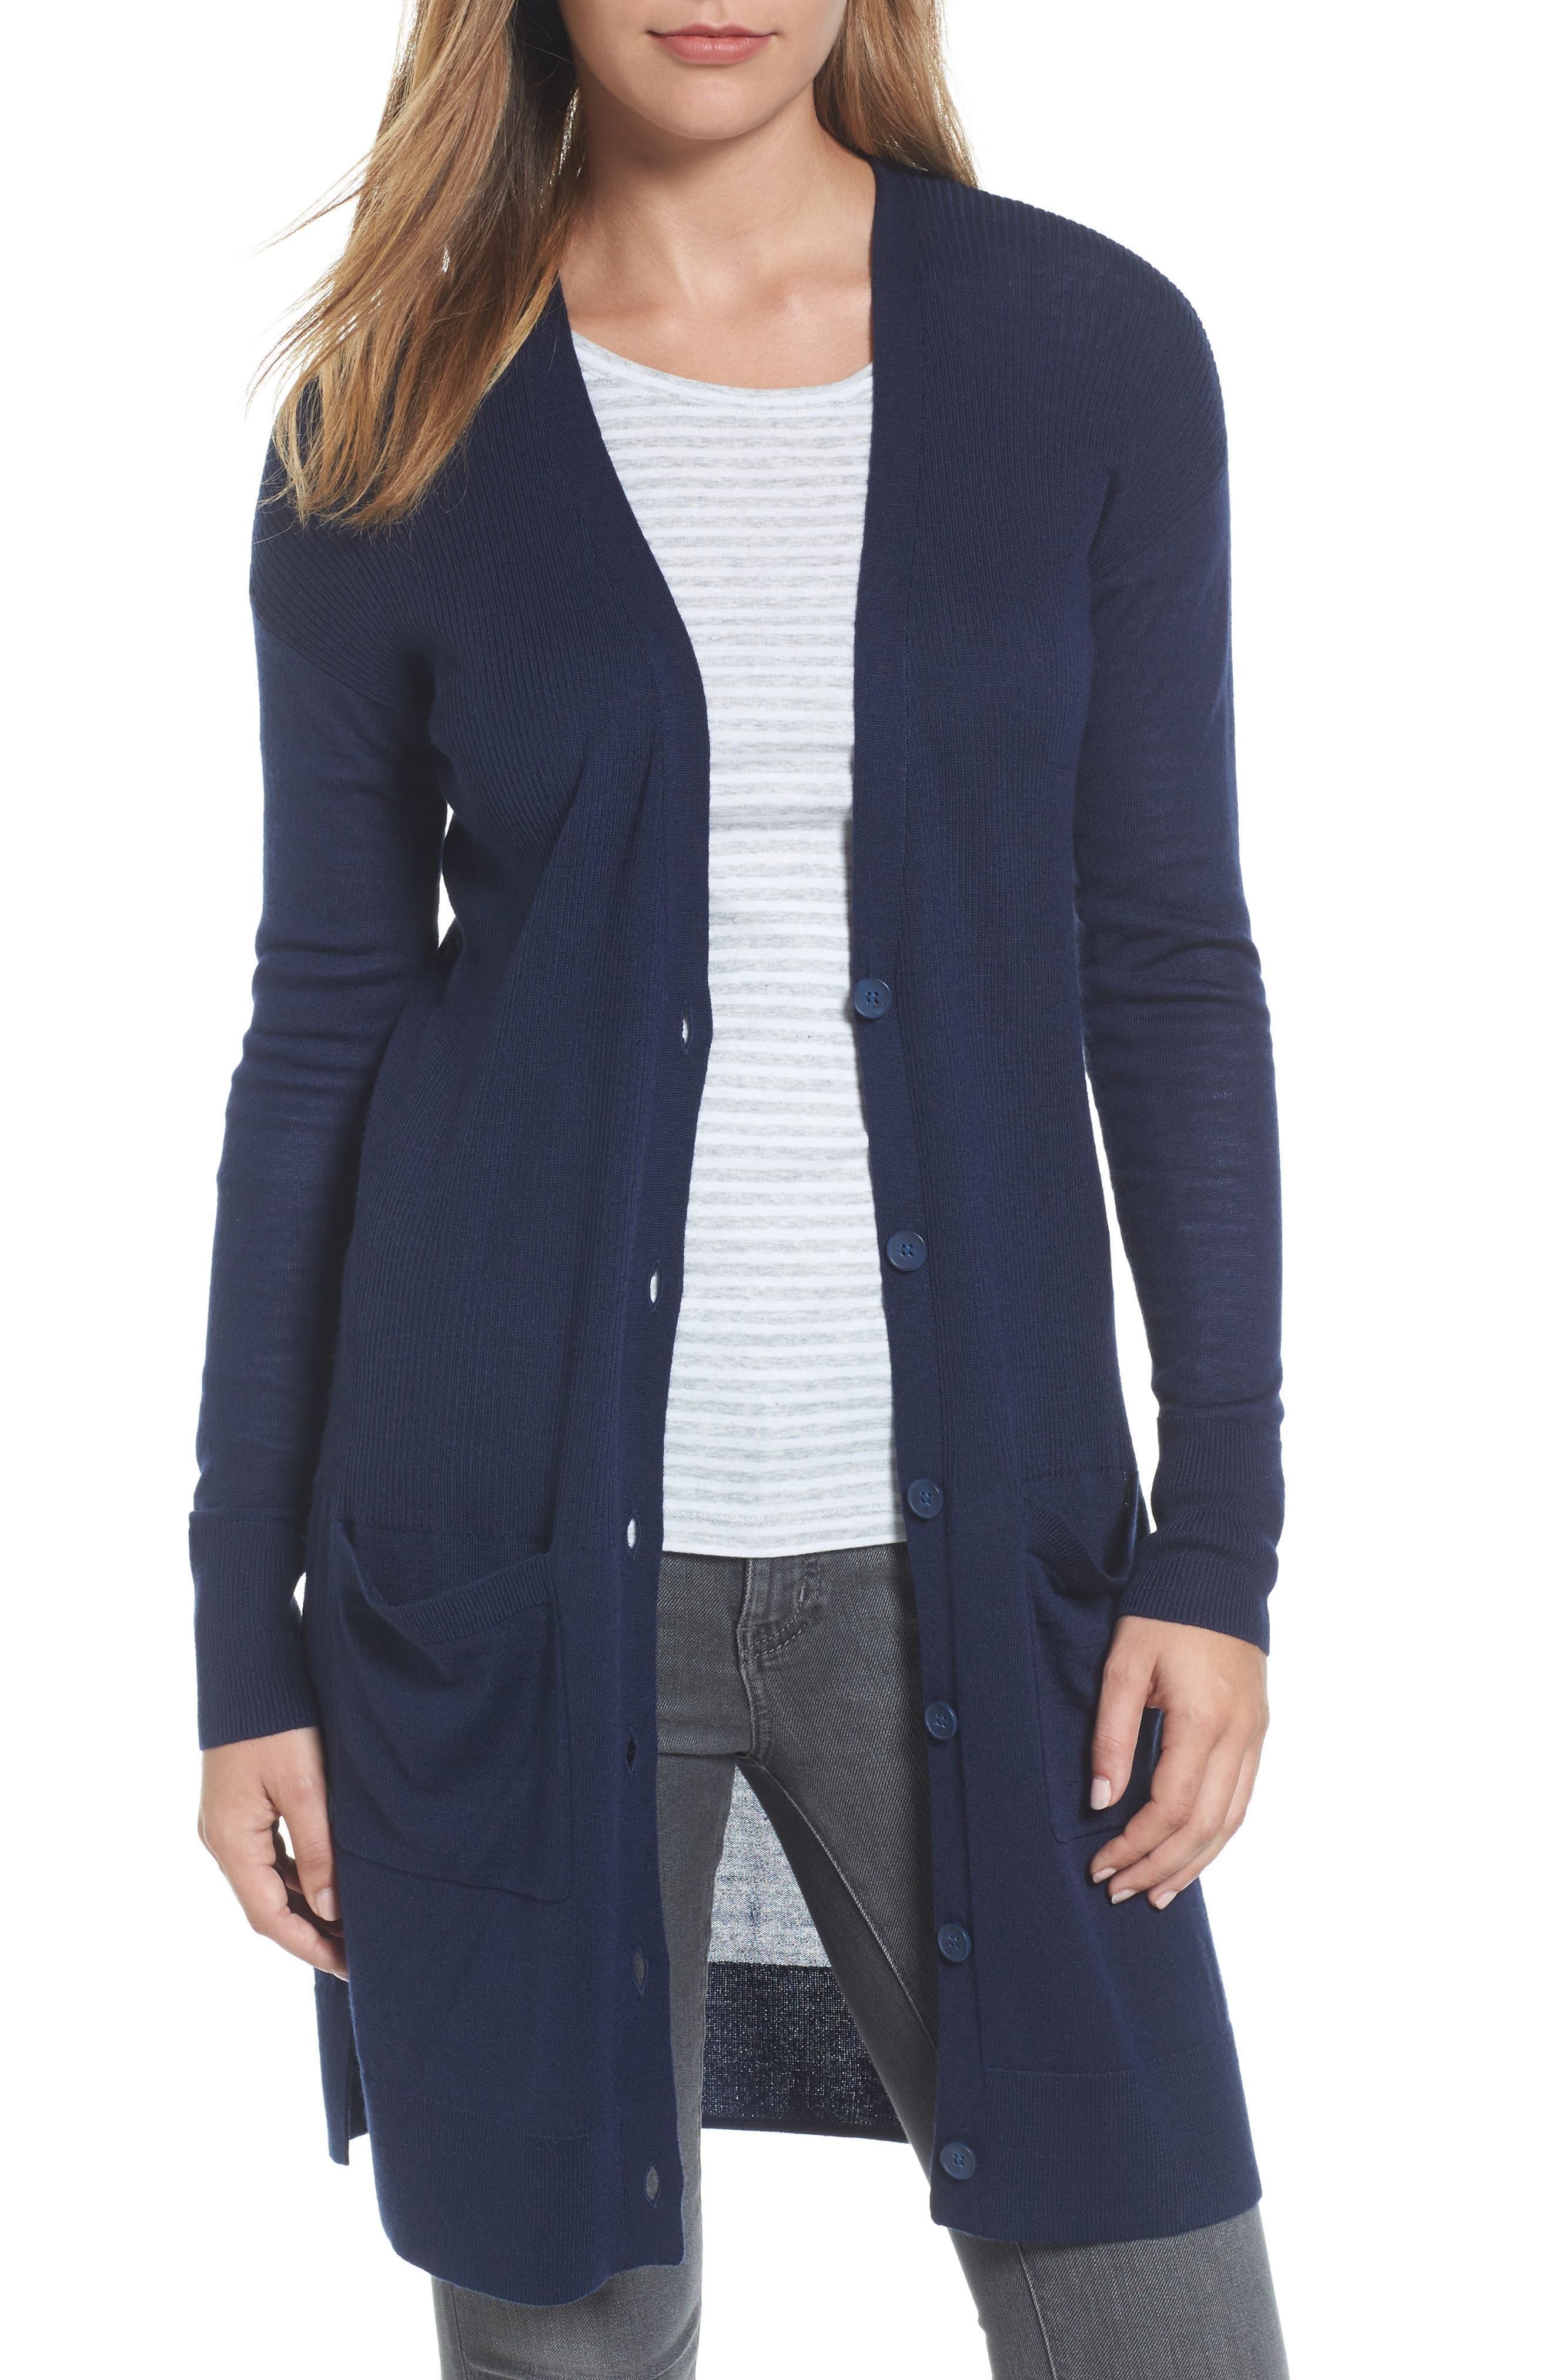 Main Image - Halogen® Rib Knit Wool Blend Cardigan (Regular & Petite)